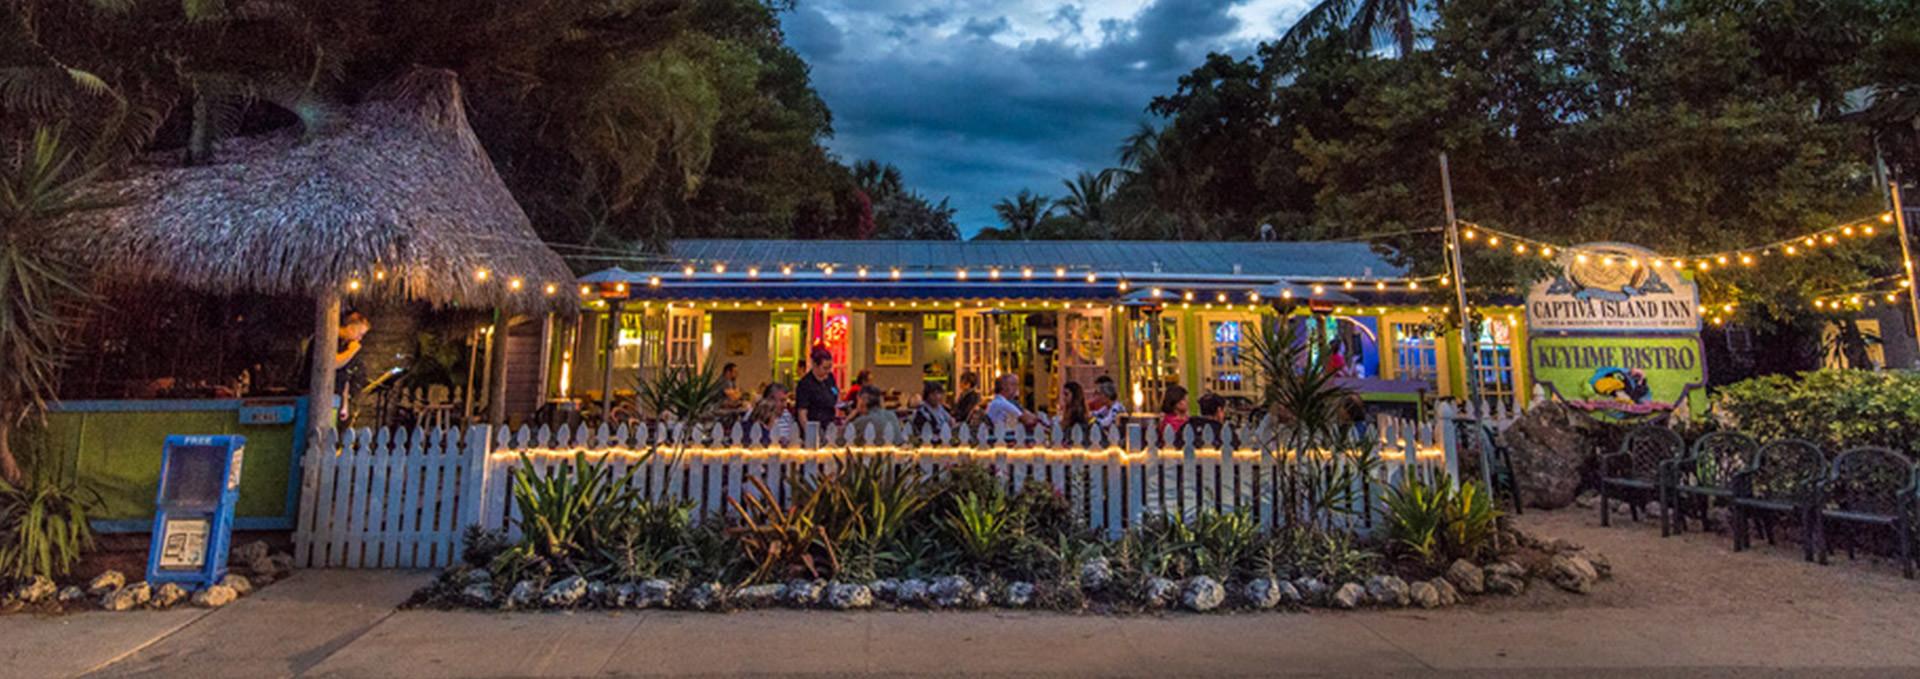 Captiva Island Restaurant - Keylime-Bistro-Restaurant